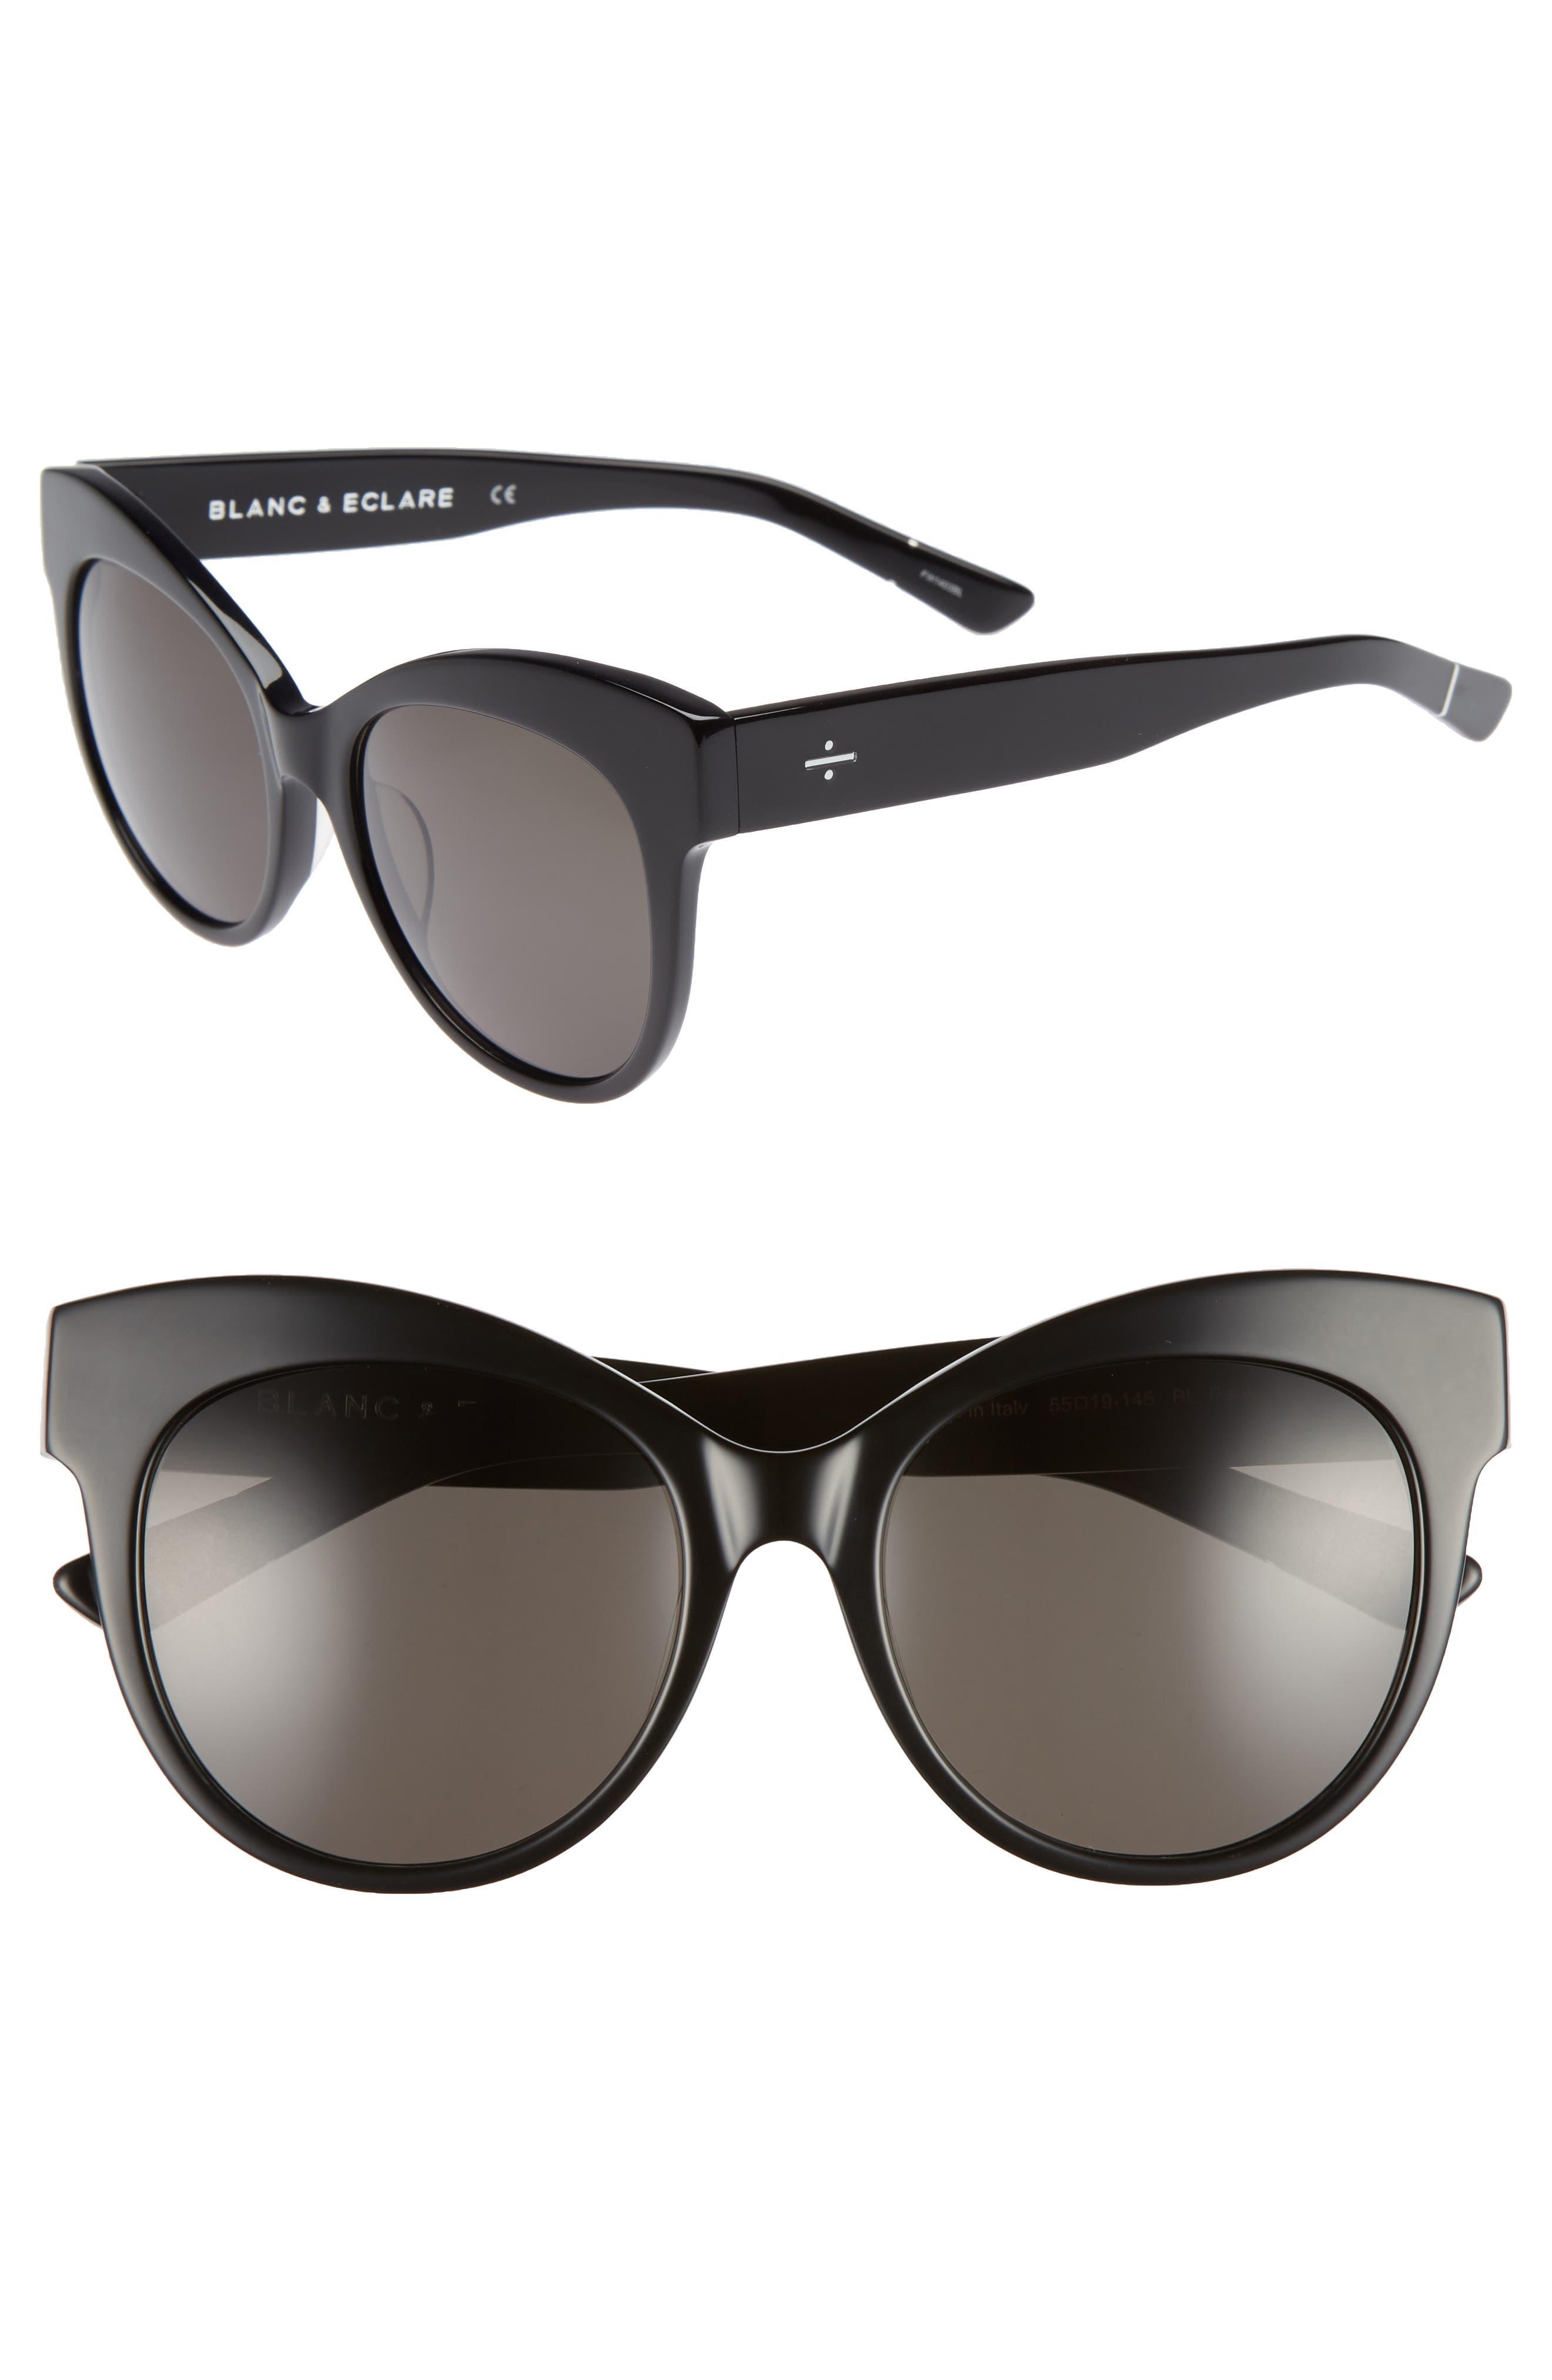 BLANC & ECLARE Paris 55mm Polarized Cat Eye Sunglasses,                             Main thumbnail 1, color,                             001